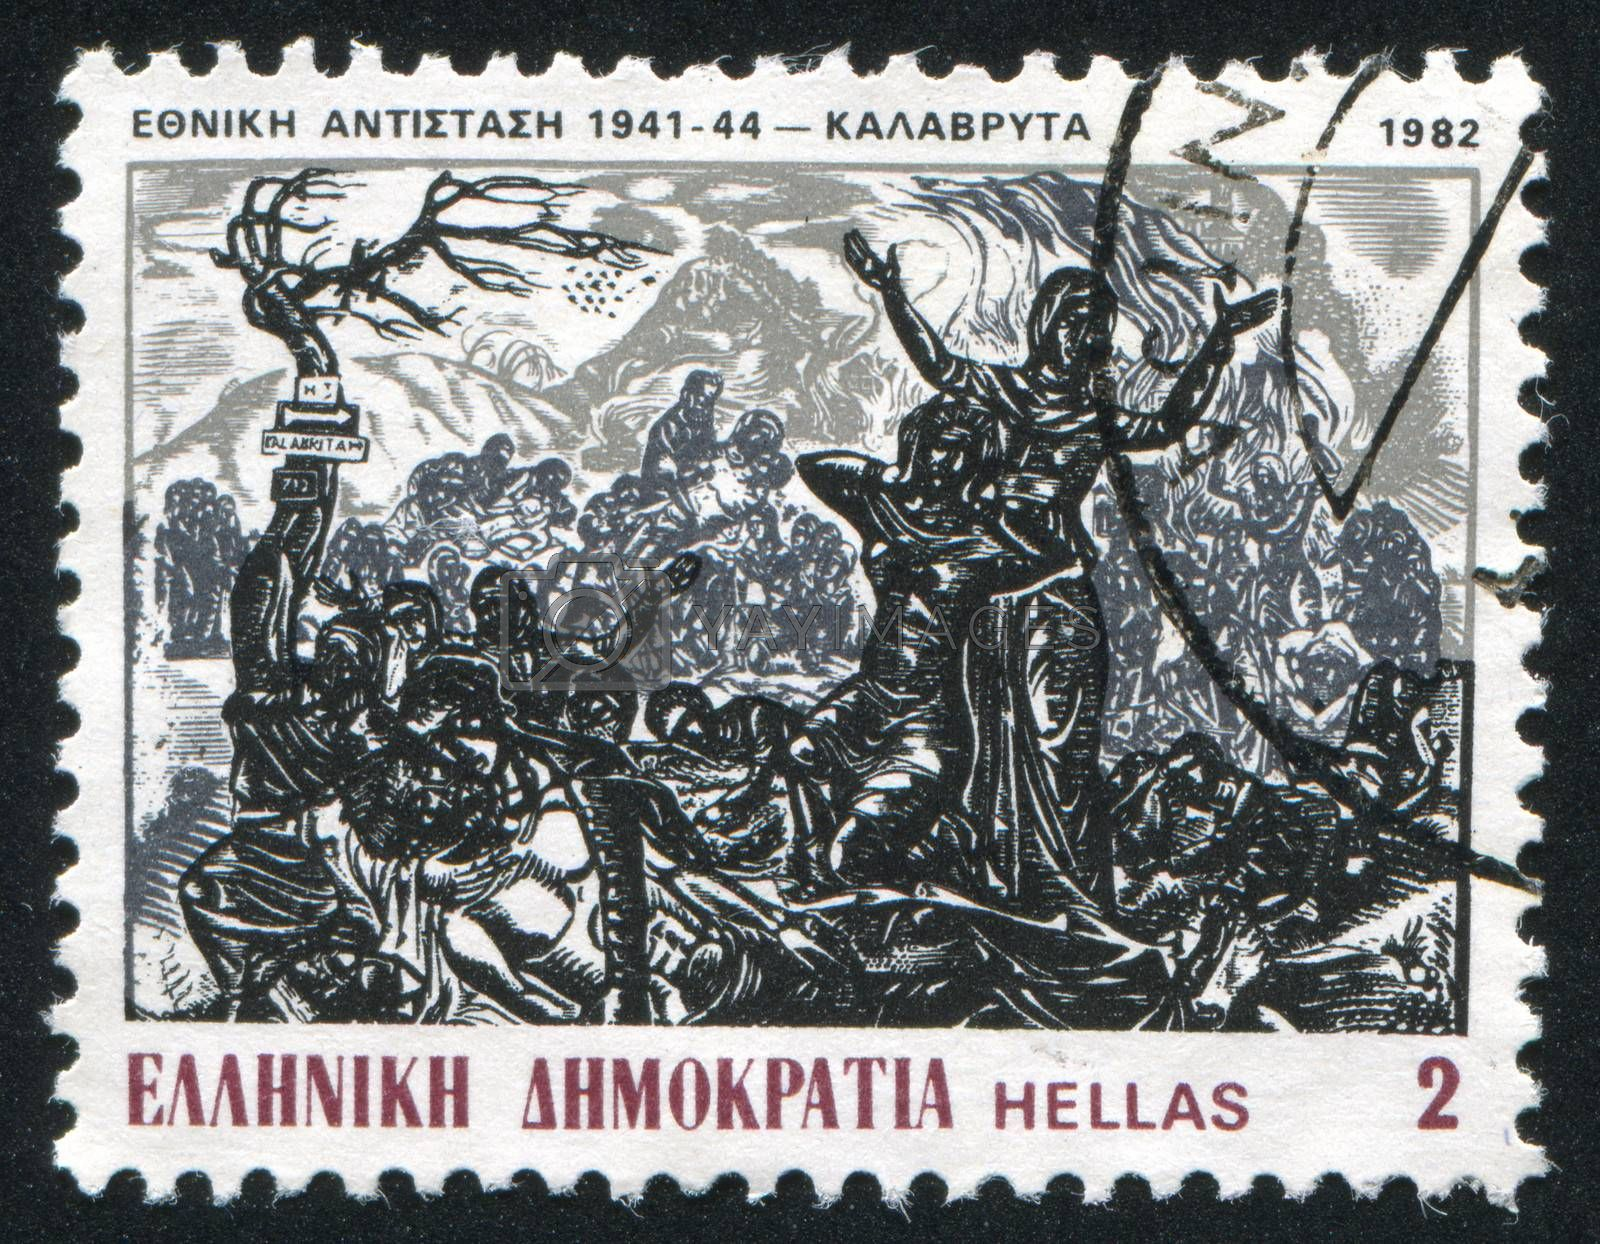 GREECE - CIRCA 1982: stamp printed by Greece, shows Sacrifice of inhabitants of Kalavrita, by S. Vasiliou, circa 1982